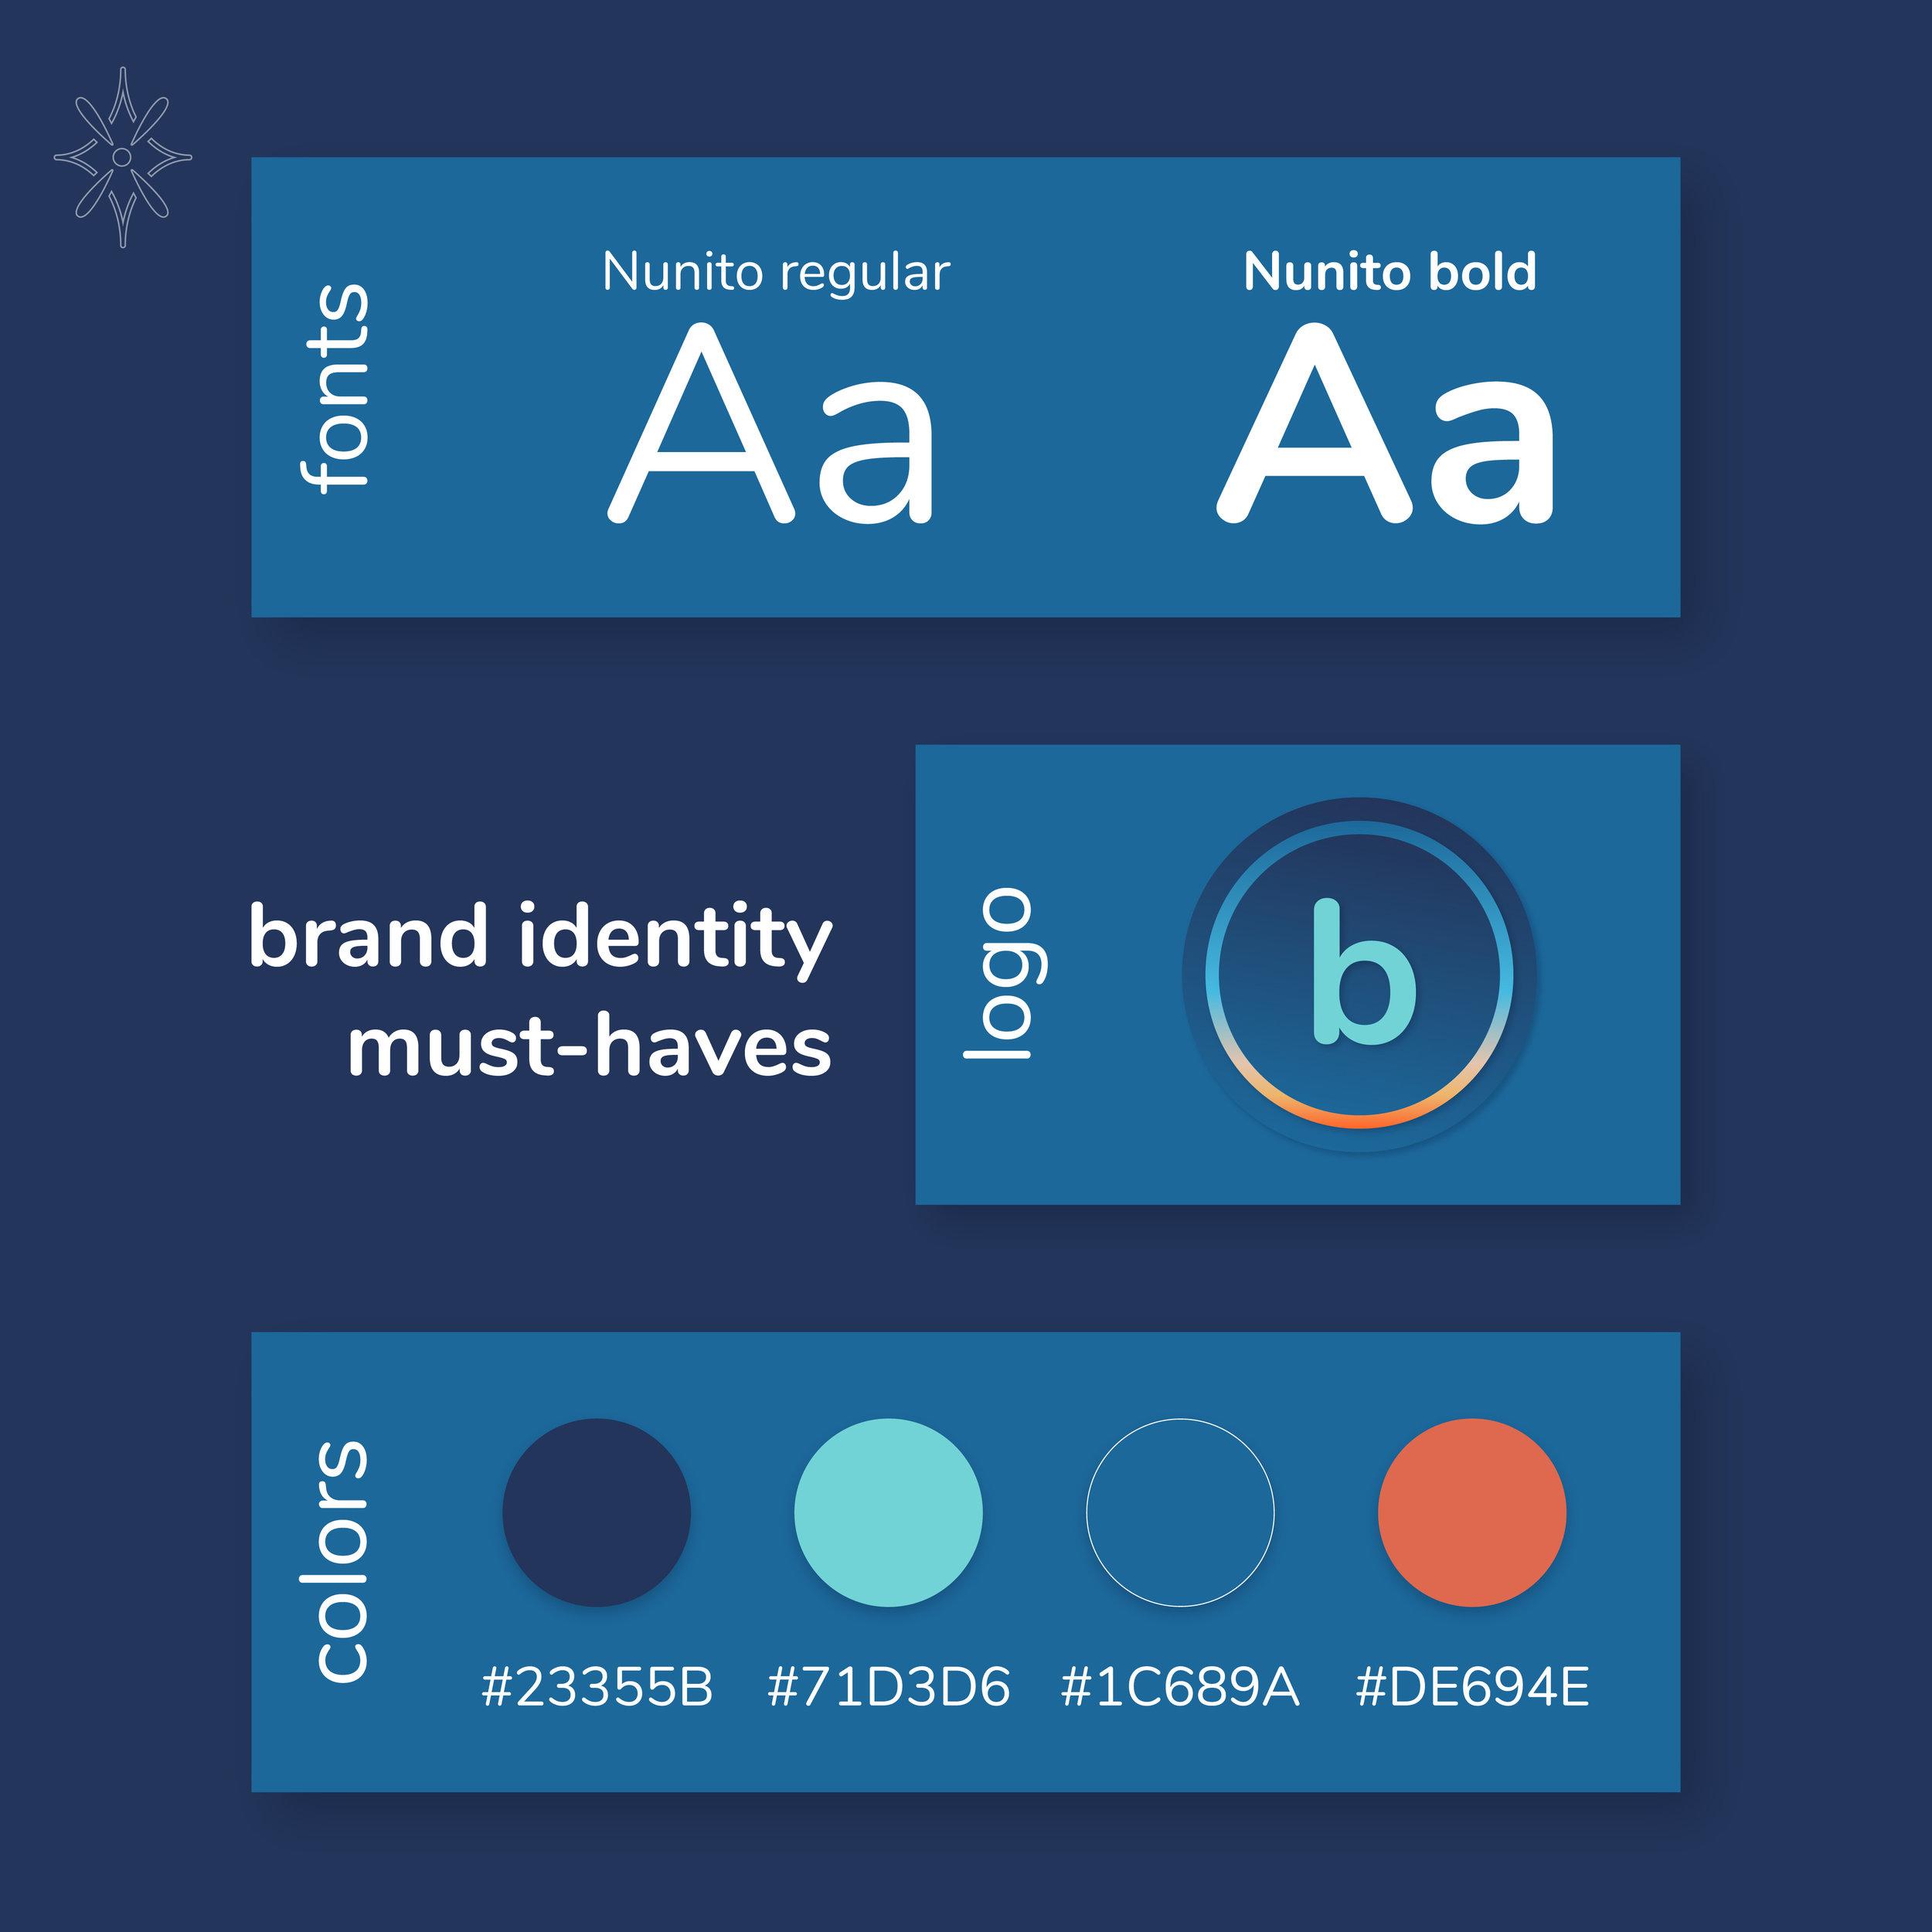 190703_Brand identity must haves-01.jpg